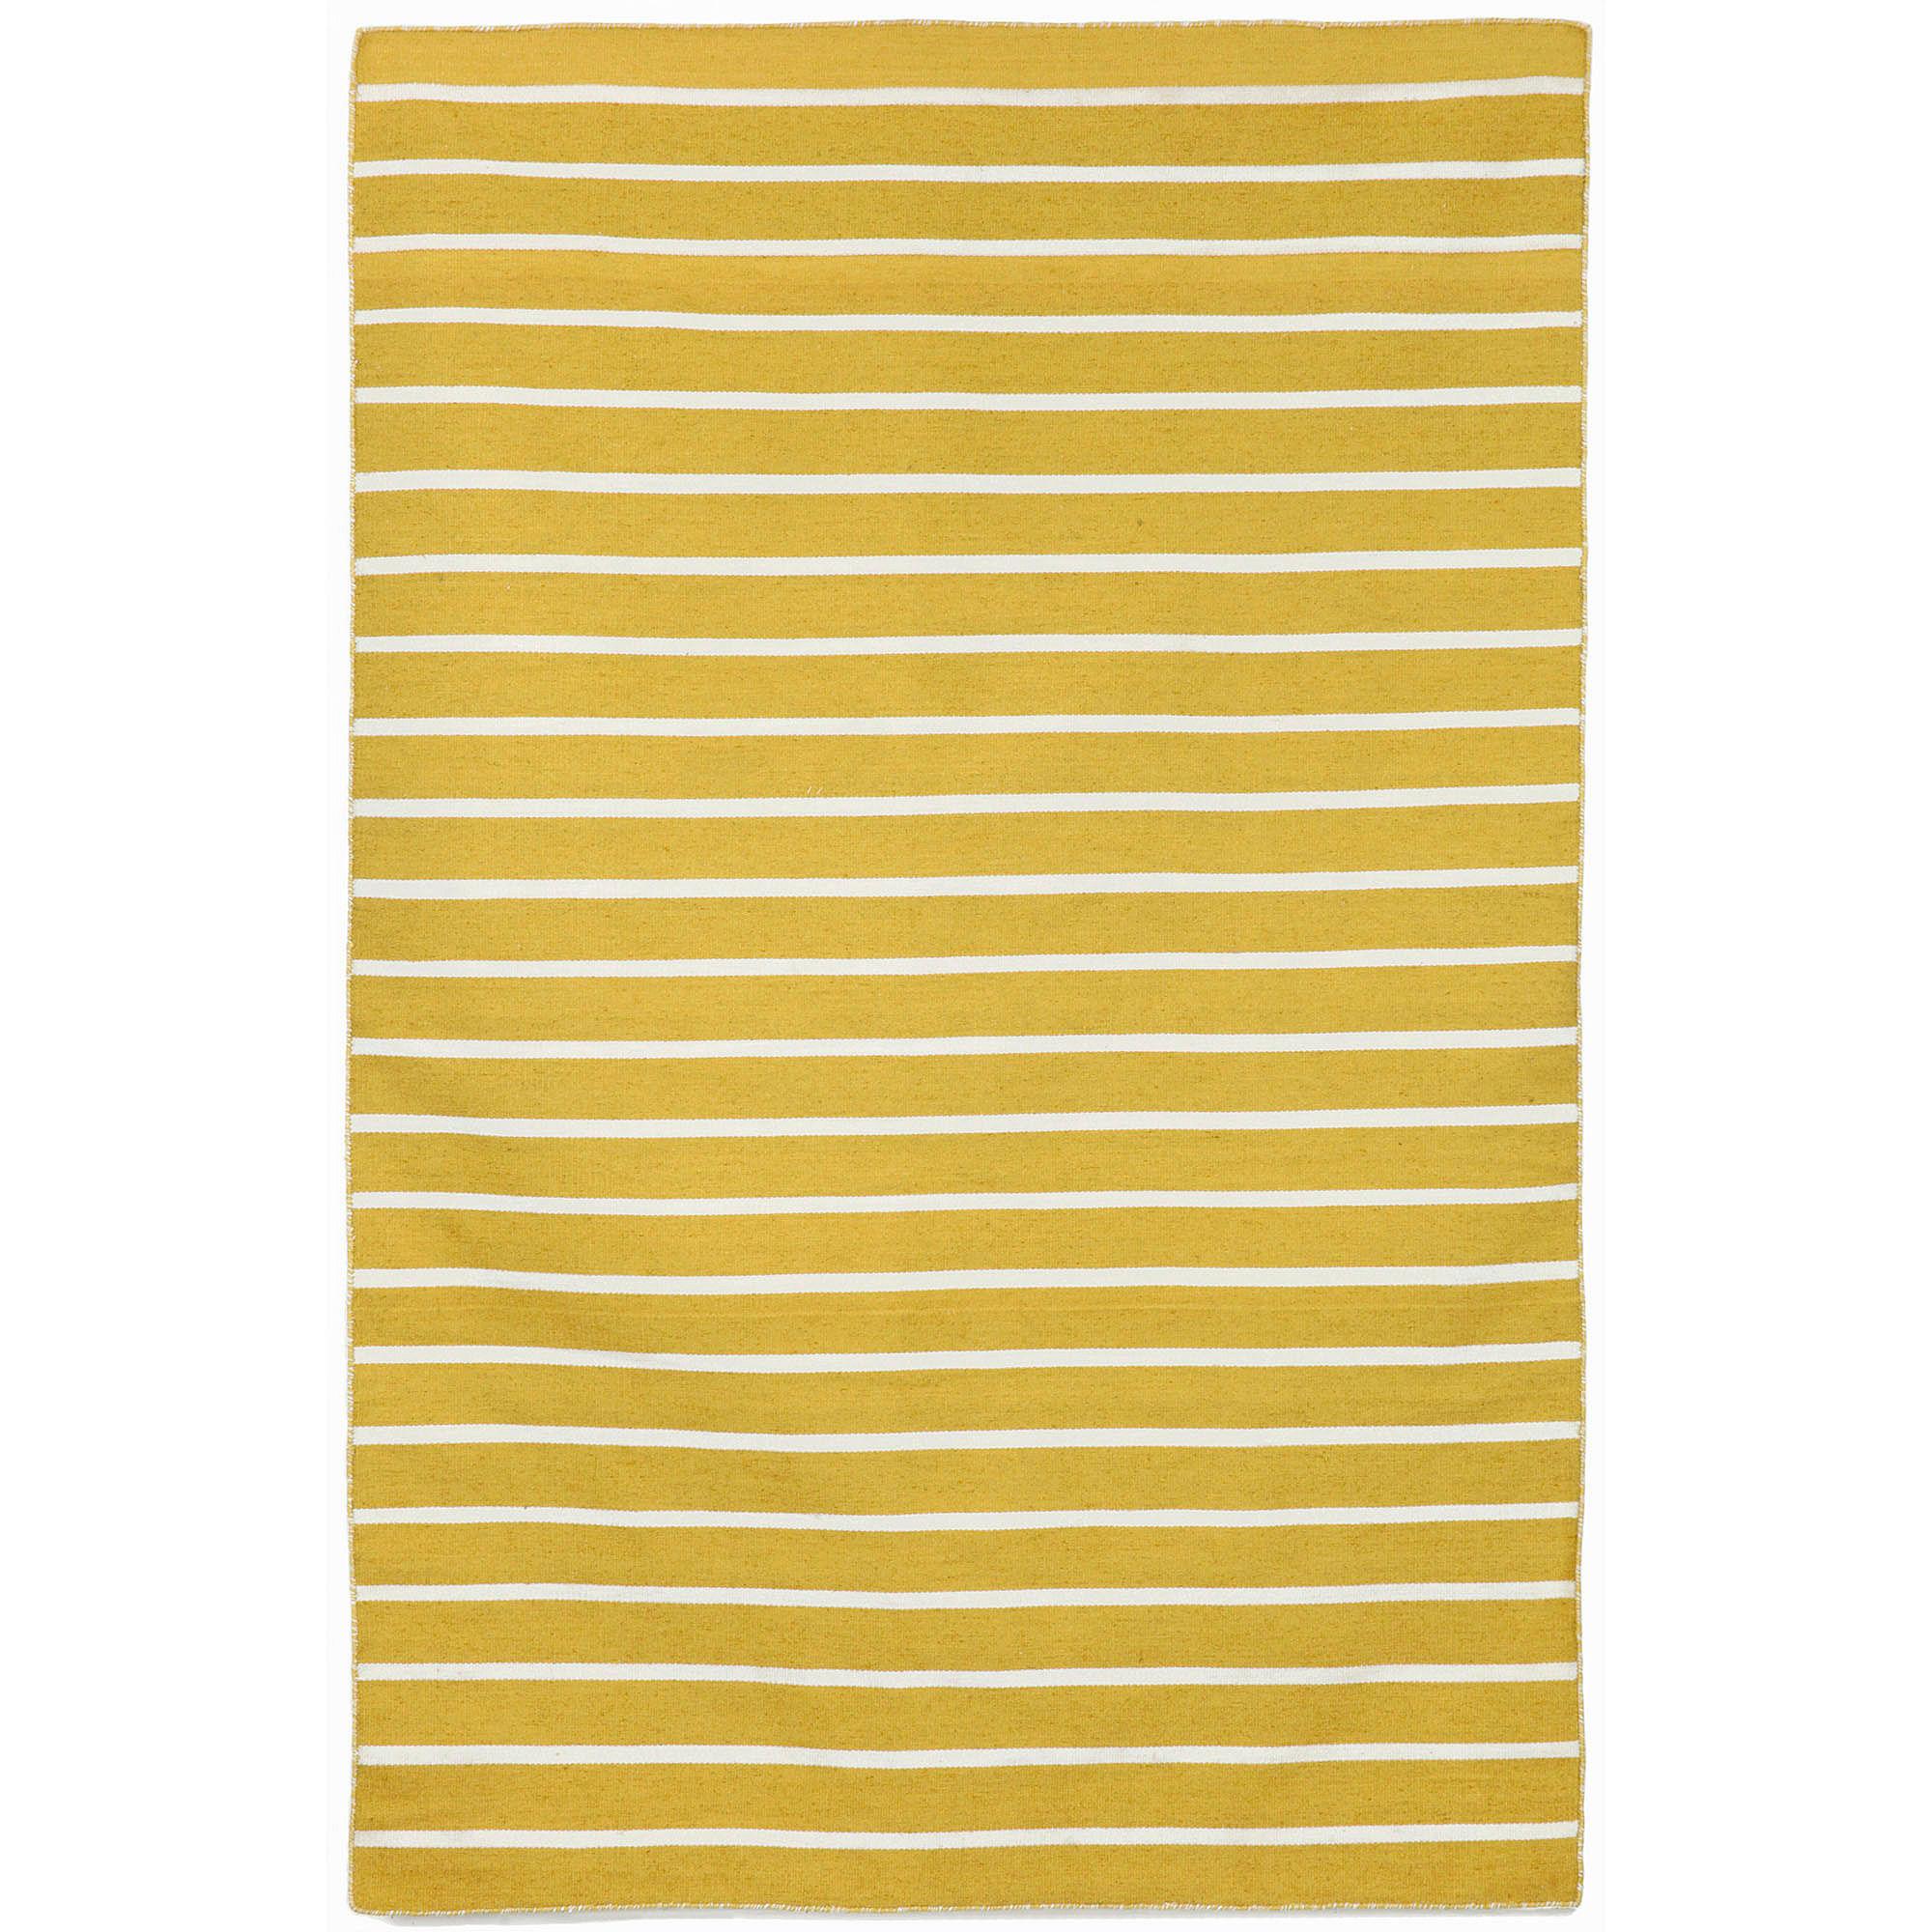 Liora Manne Sorrento Pinstripe Rectangular Rugs